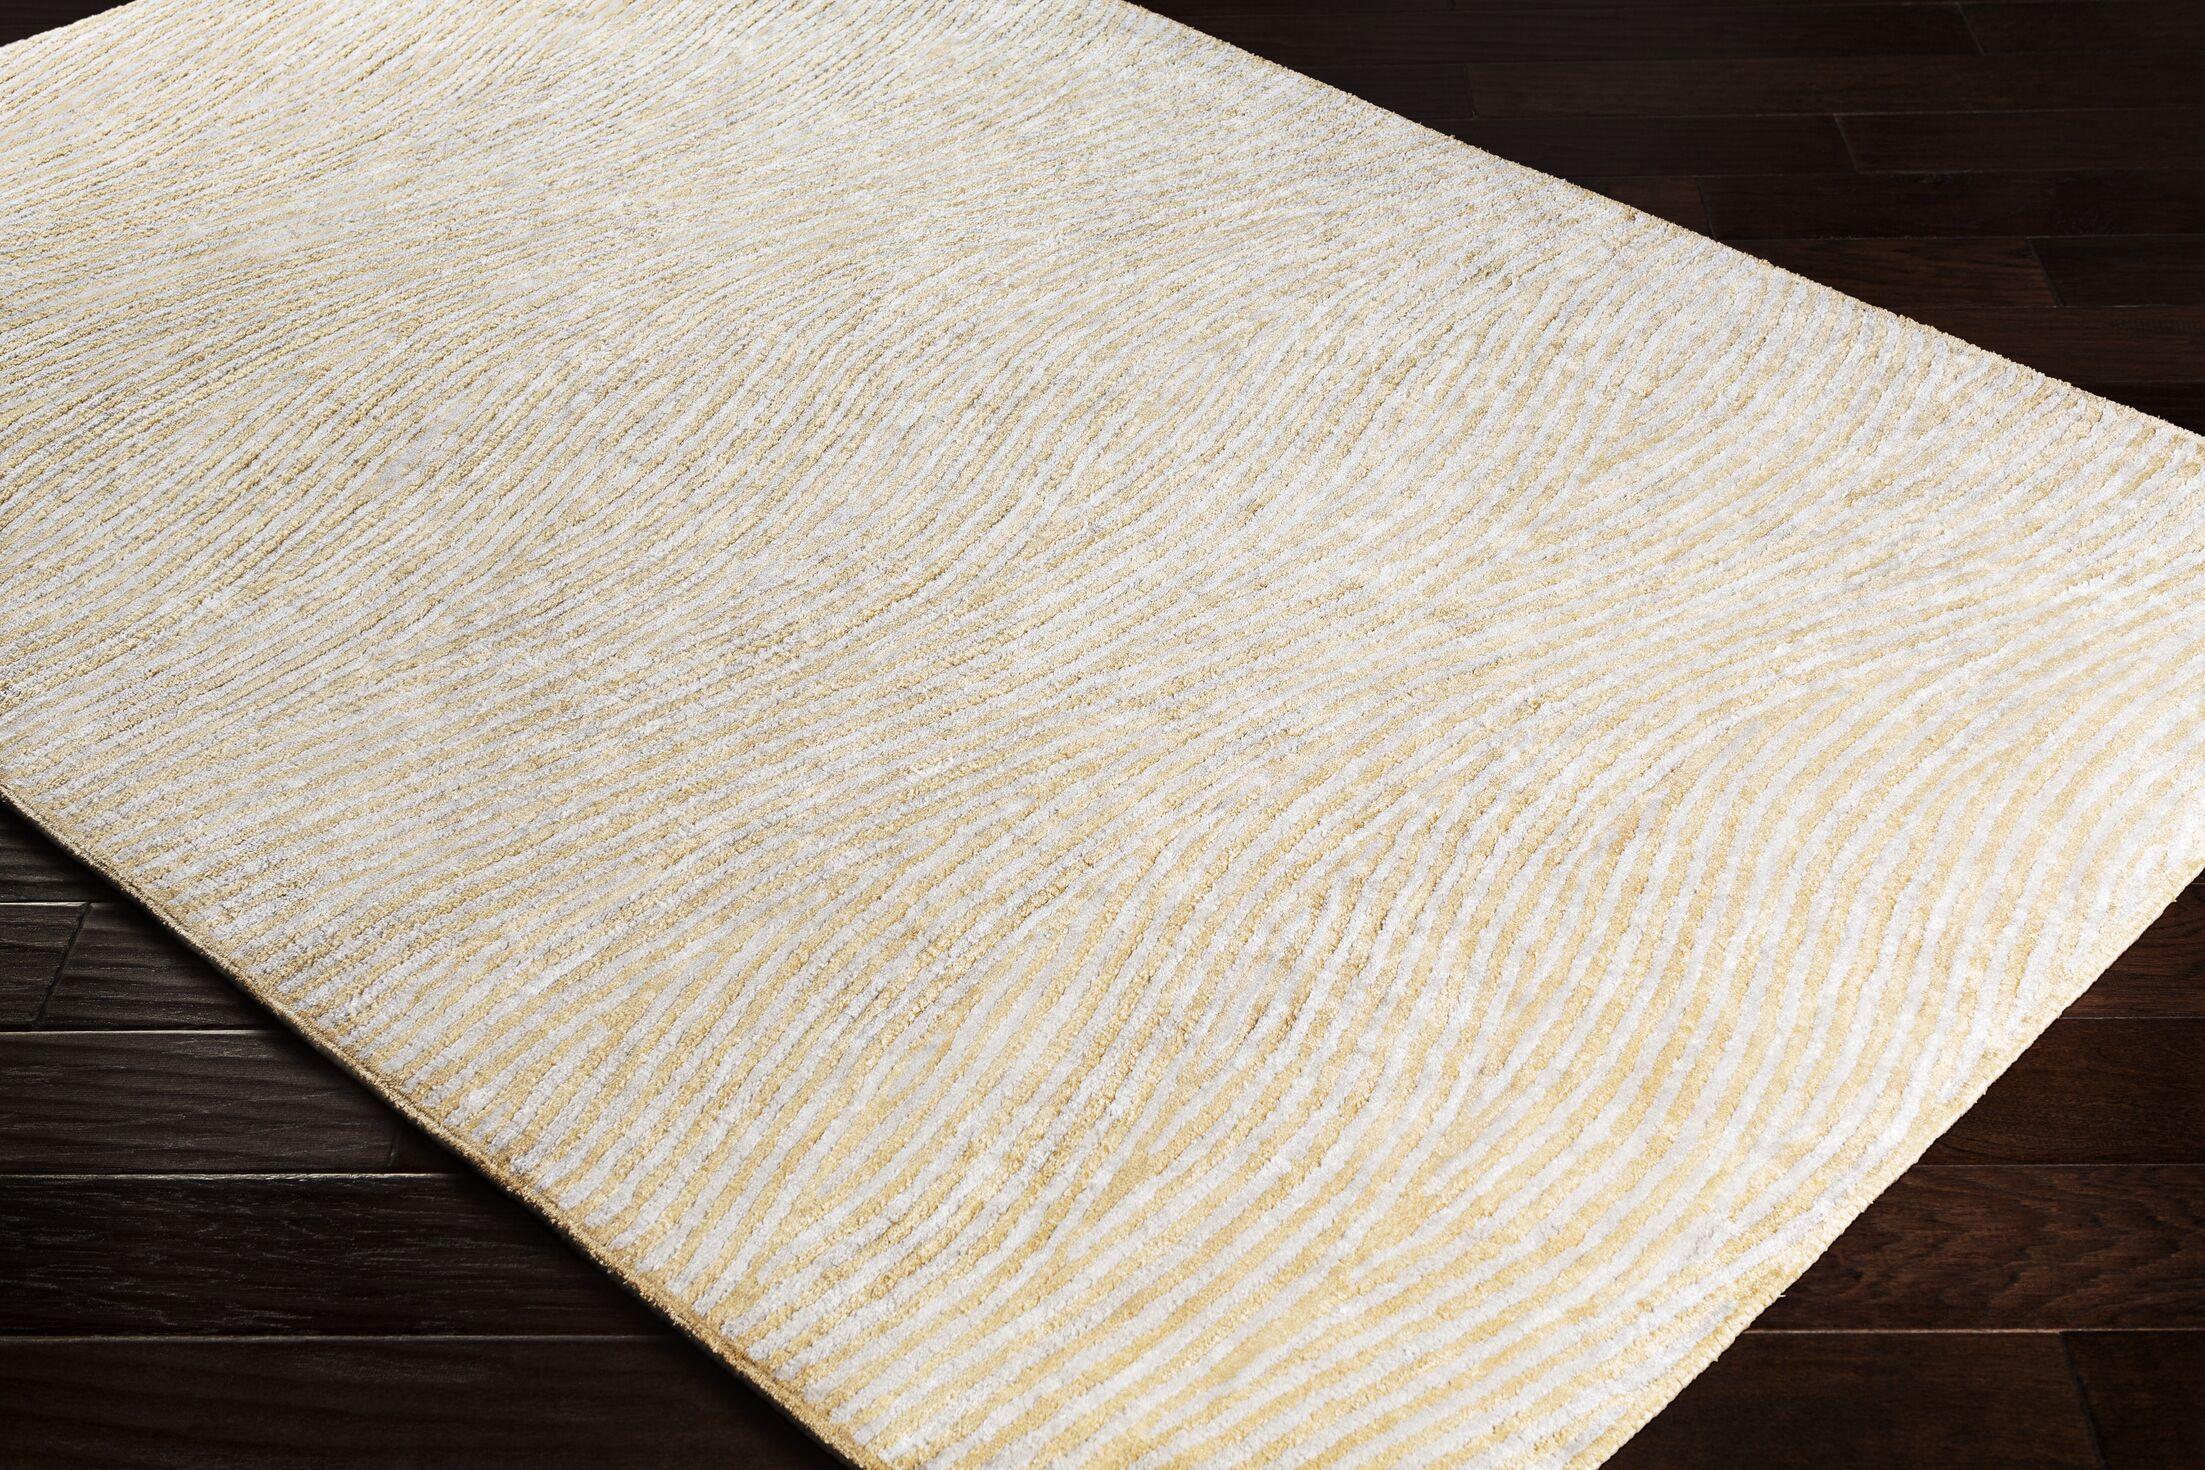 Alverez Hand-Woven Khaki/Gray Area Rug Rug Size: Rectangle 4' x 6'